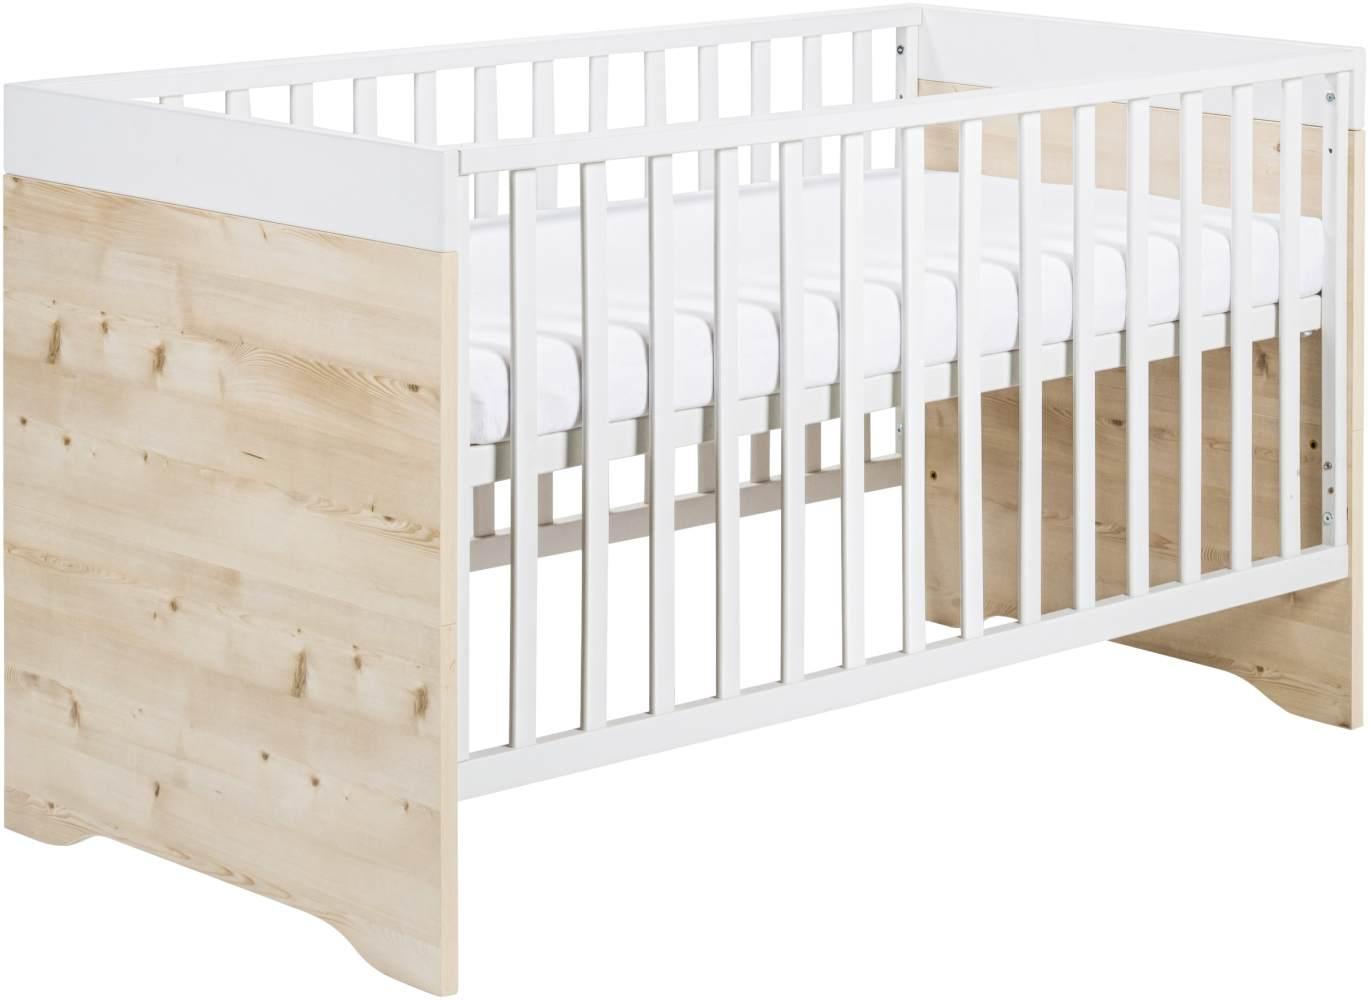 Schardt 'Timber Pinie' Kombi-Kinderbett weiß/natur Bild 1